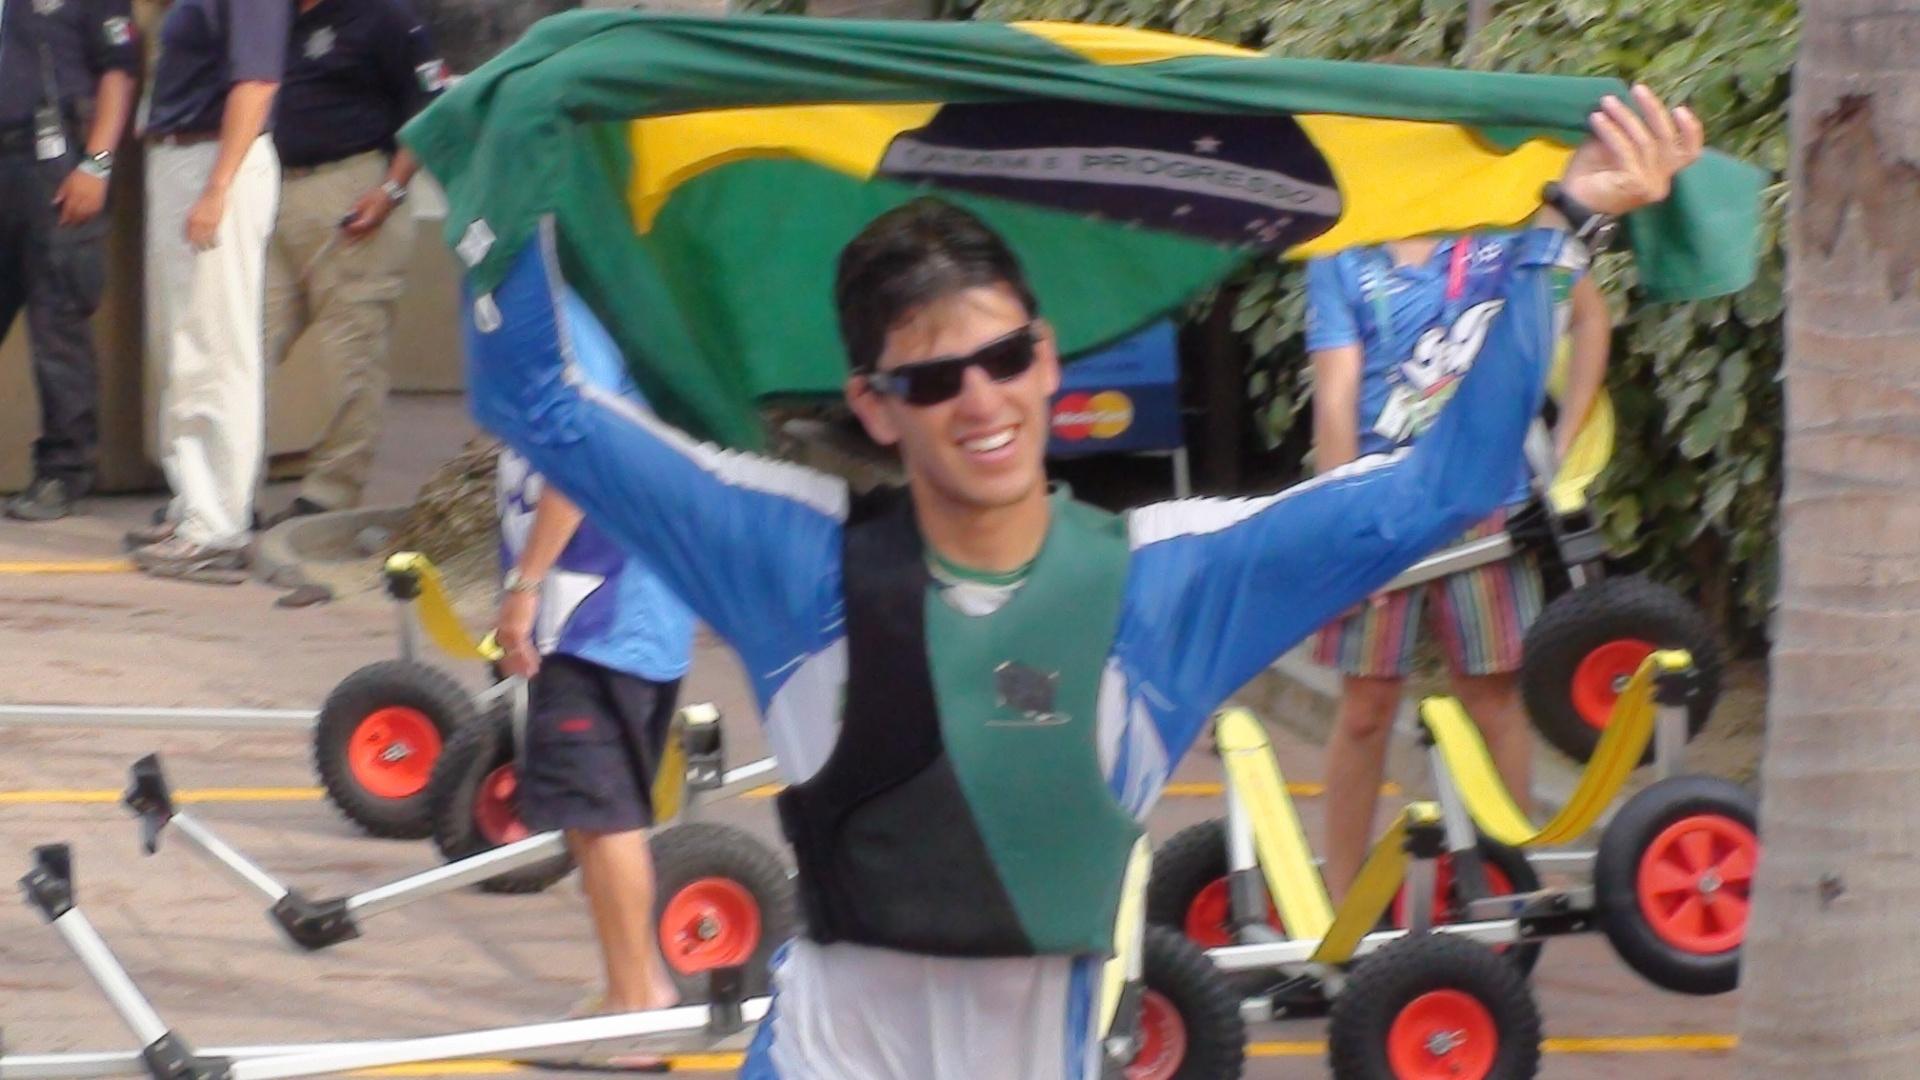 Velejador Matheus Dellagnelo comemora a medalha de ouro na classe Sunfish no Pan (22/10/2011)